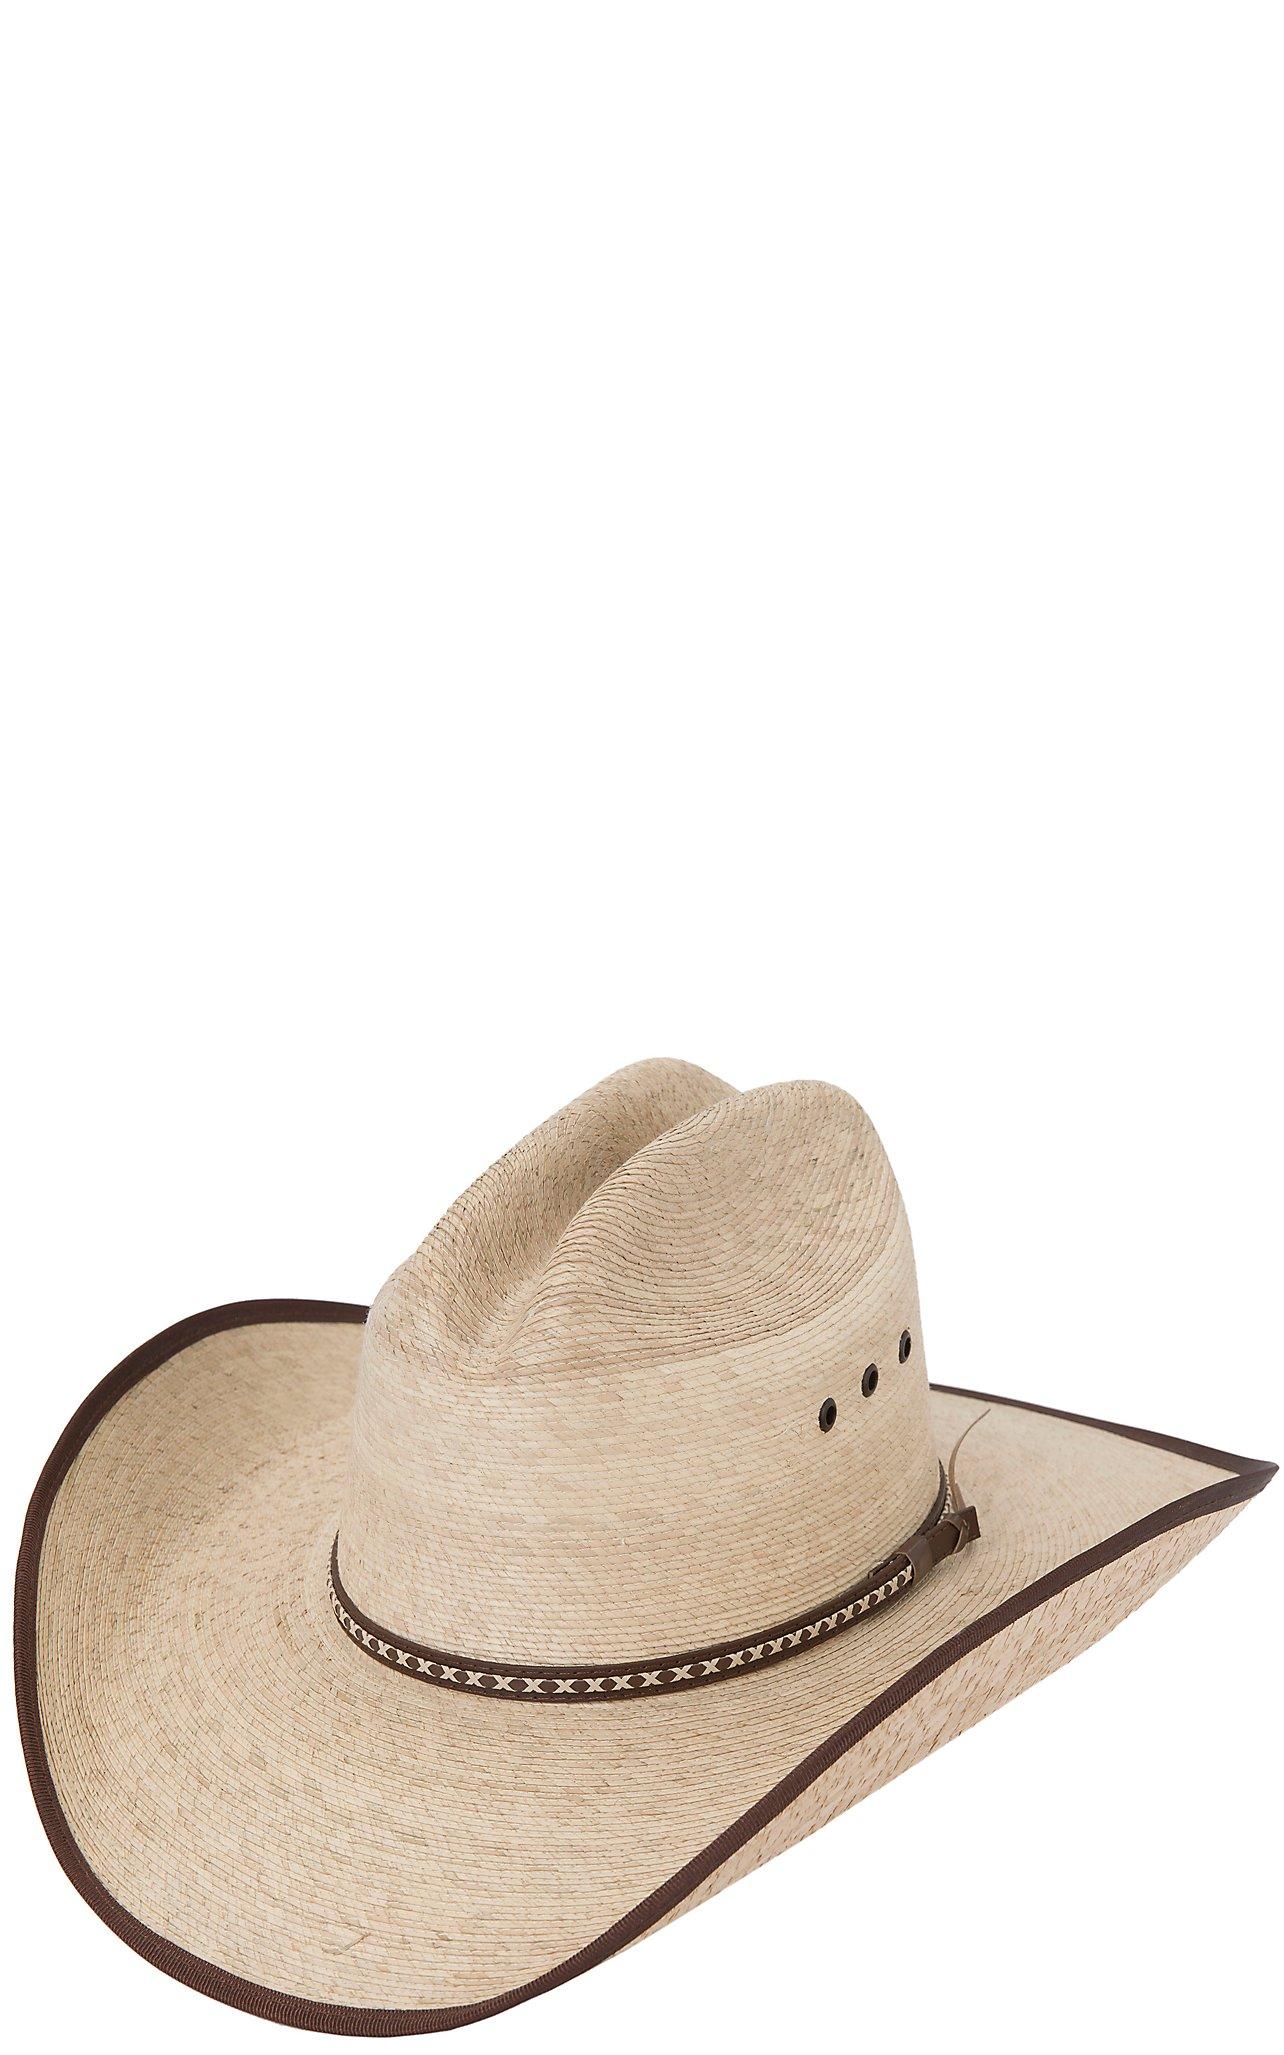 cecea2654a1 Resistol Hats Jason Aldean Hicktown Bound Edge Palm Leaf Cowboy Hat